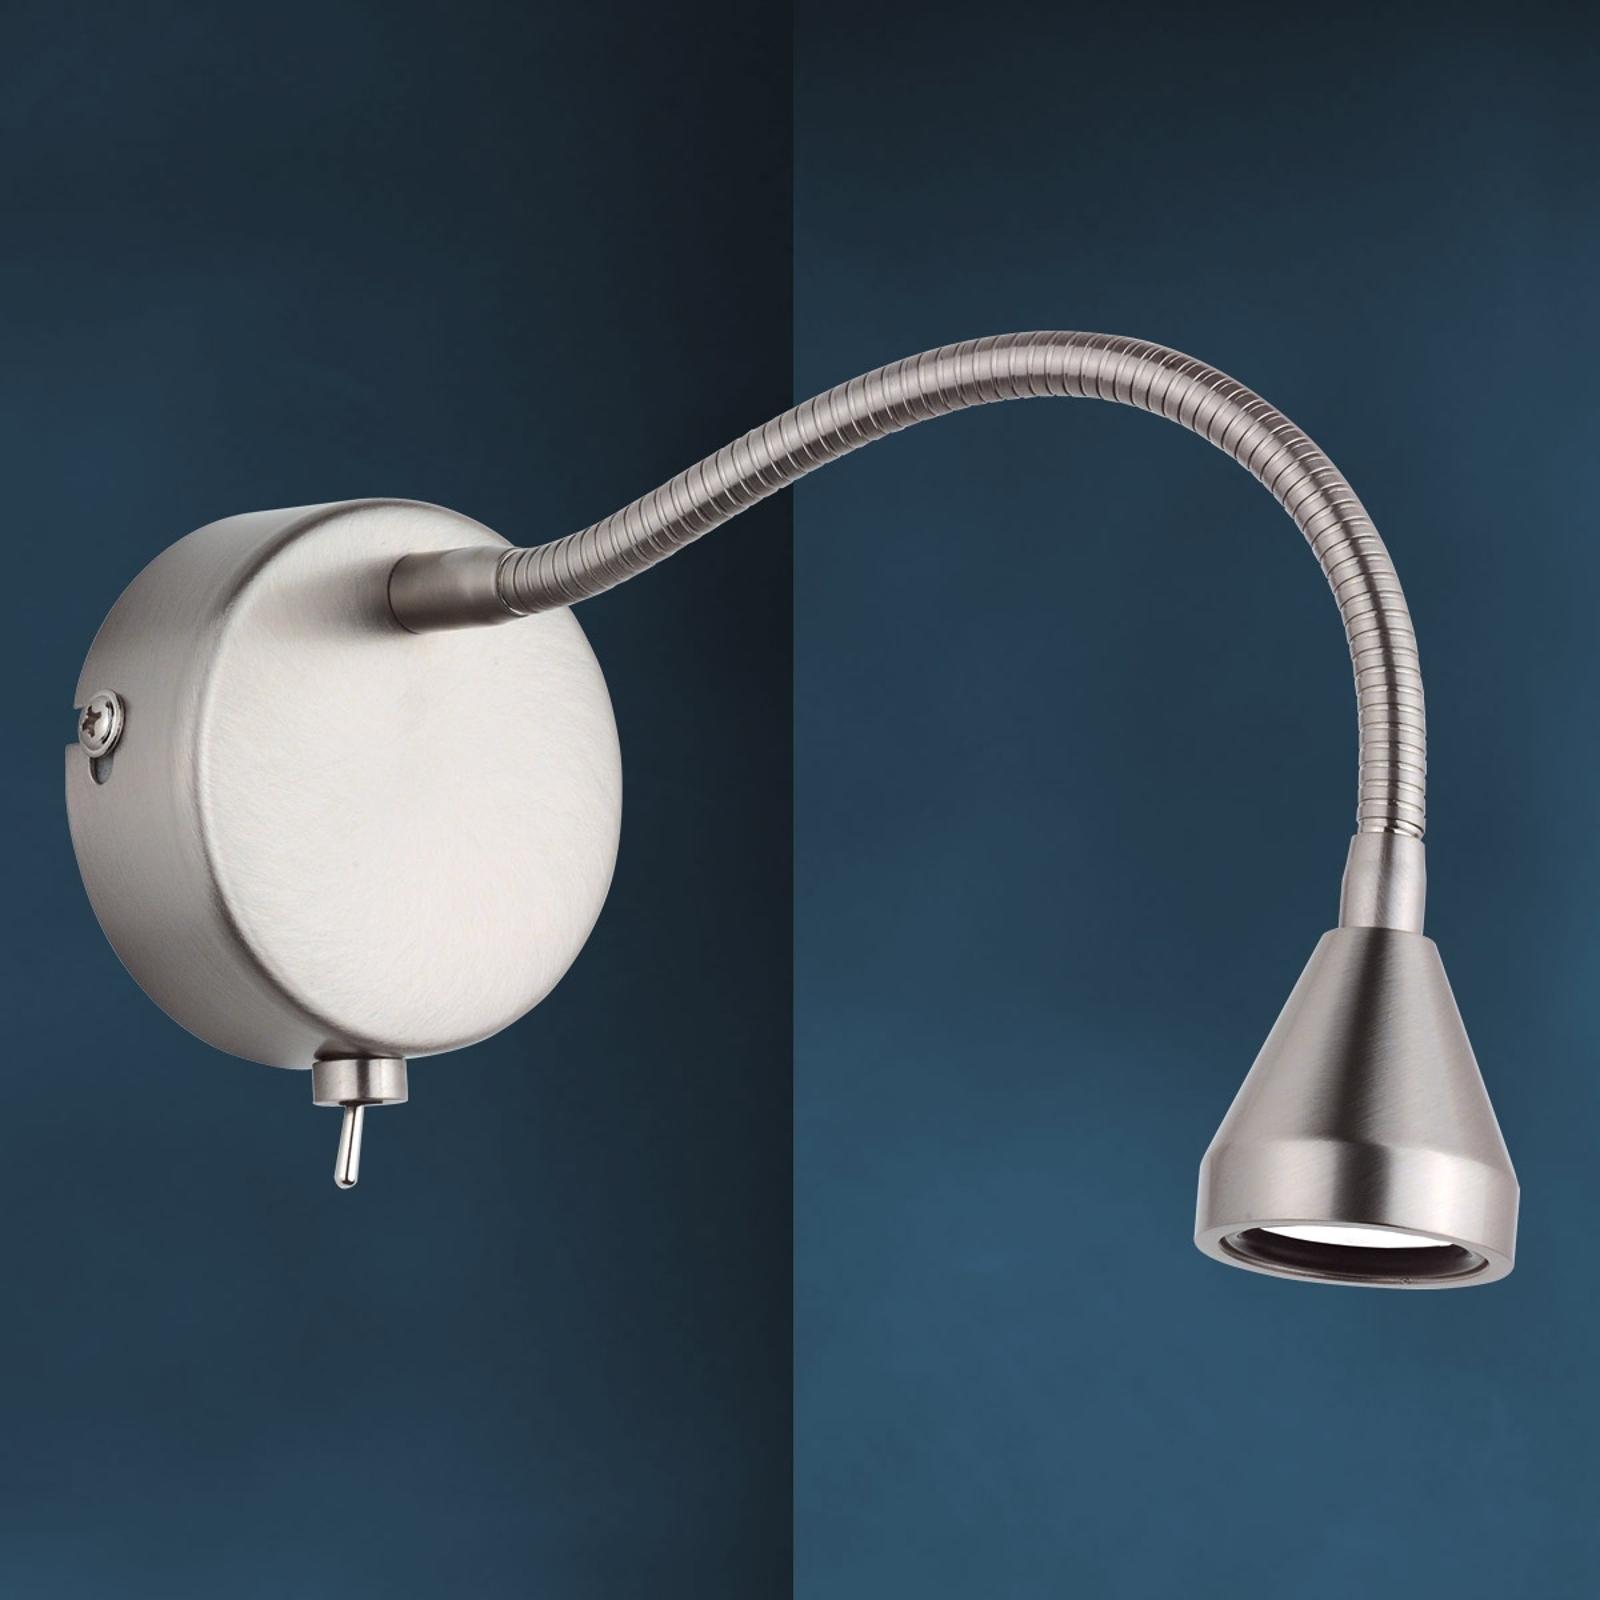 Flexibel LED-vägglampa MINI arm, universalvit